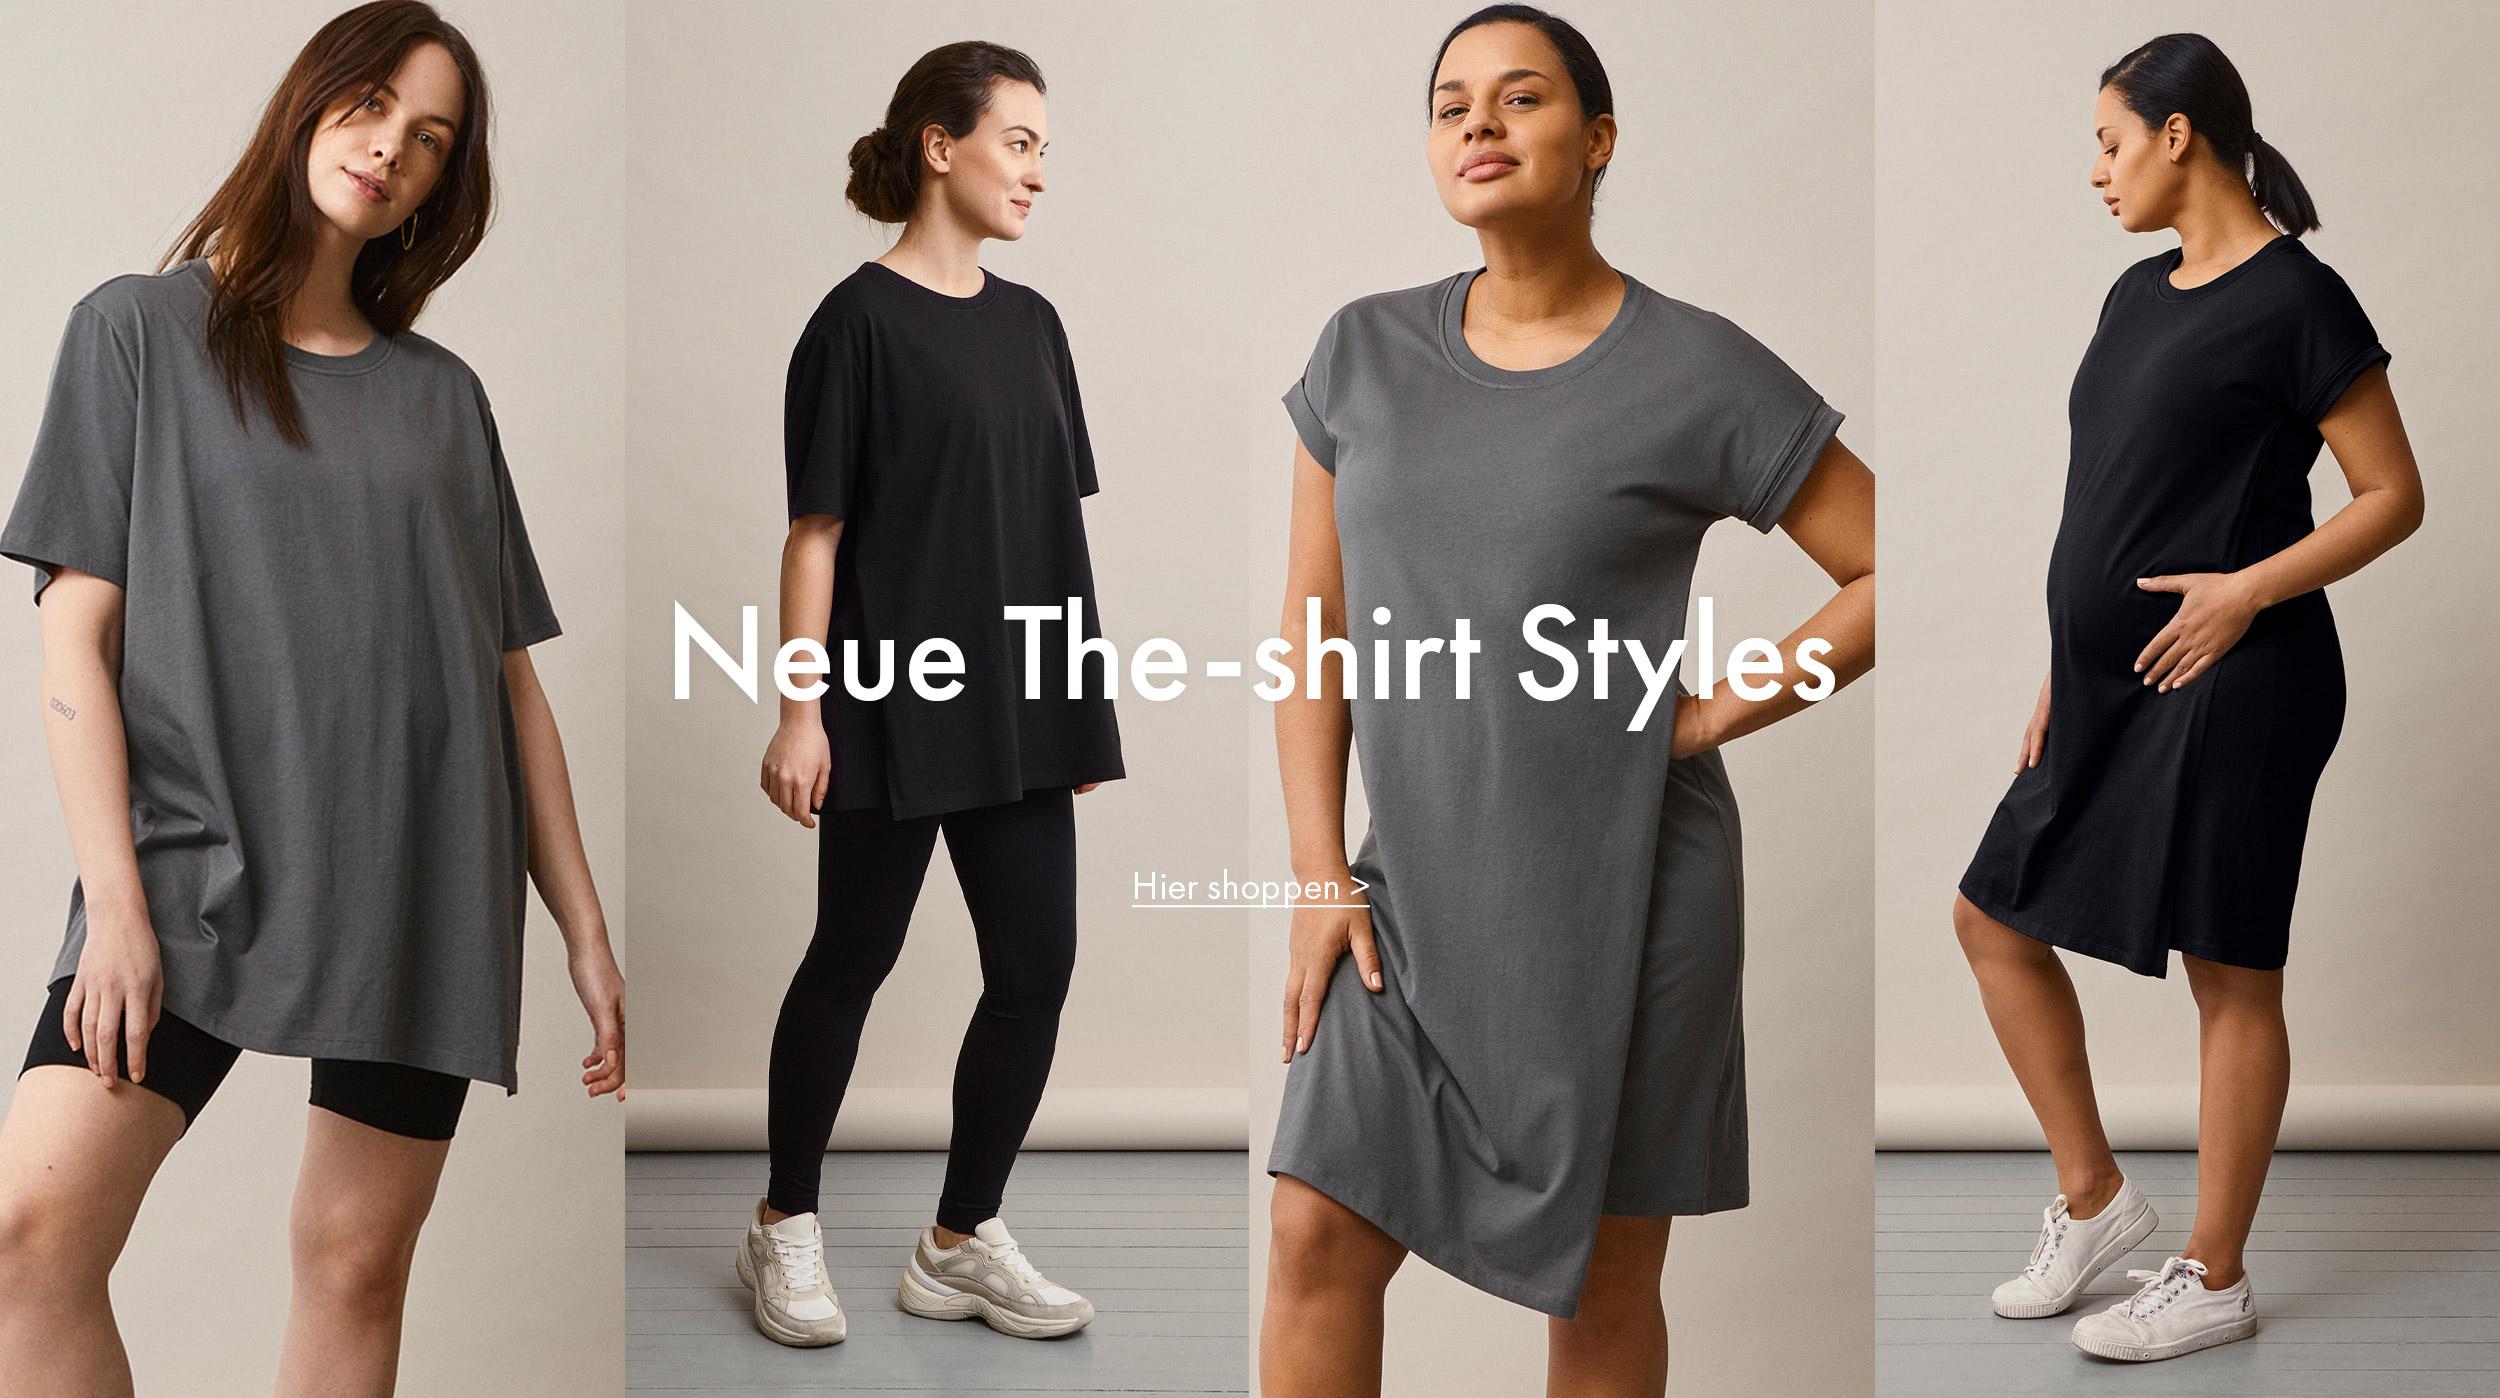 The-shirt